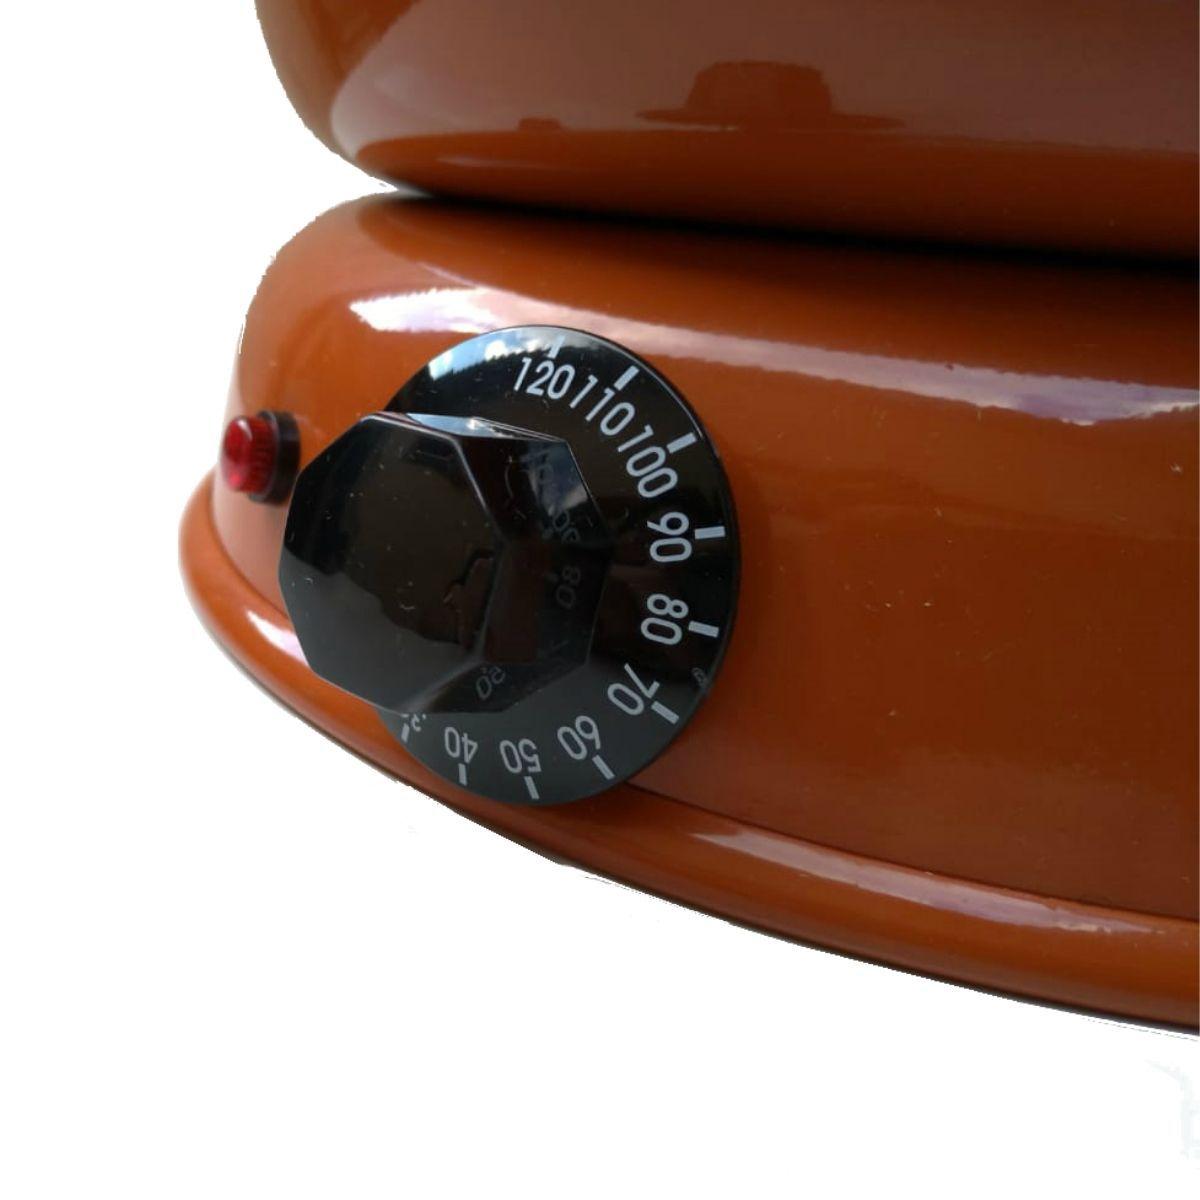 Panela Derretedeira De Chocolate Elétrica Para Até 7kg Chocolateira - DERRETEDEIRA COM VARIAÇÃO